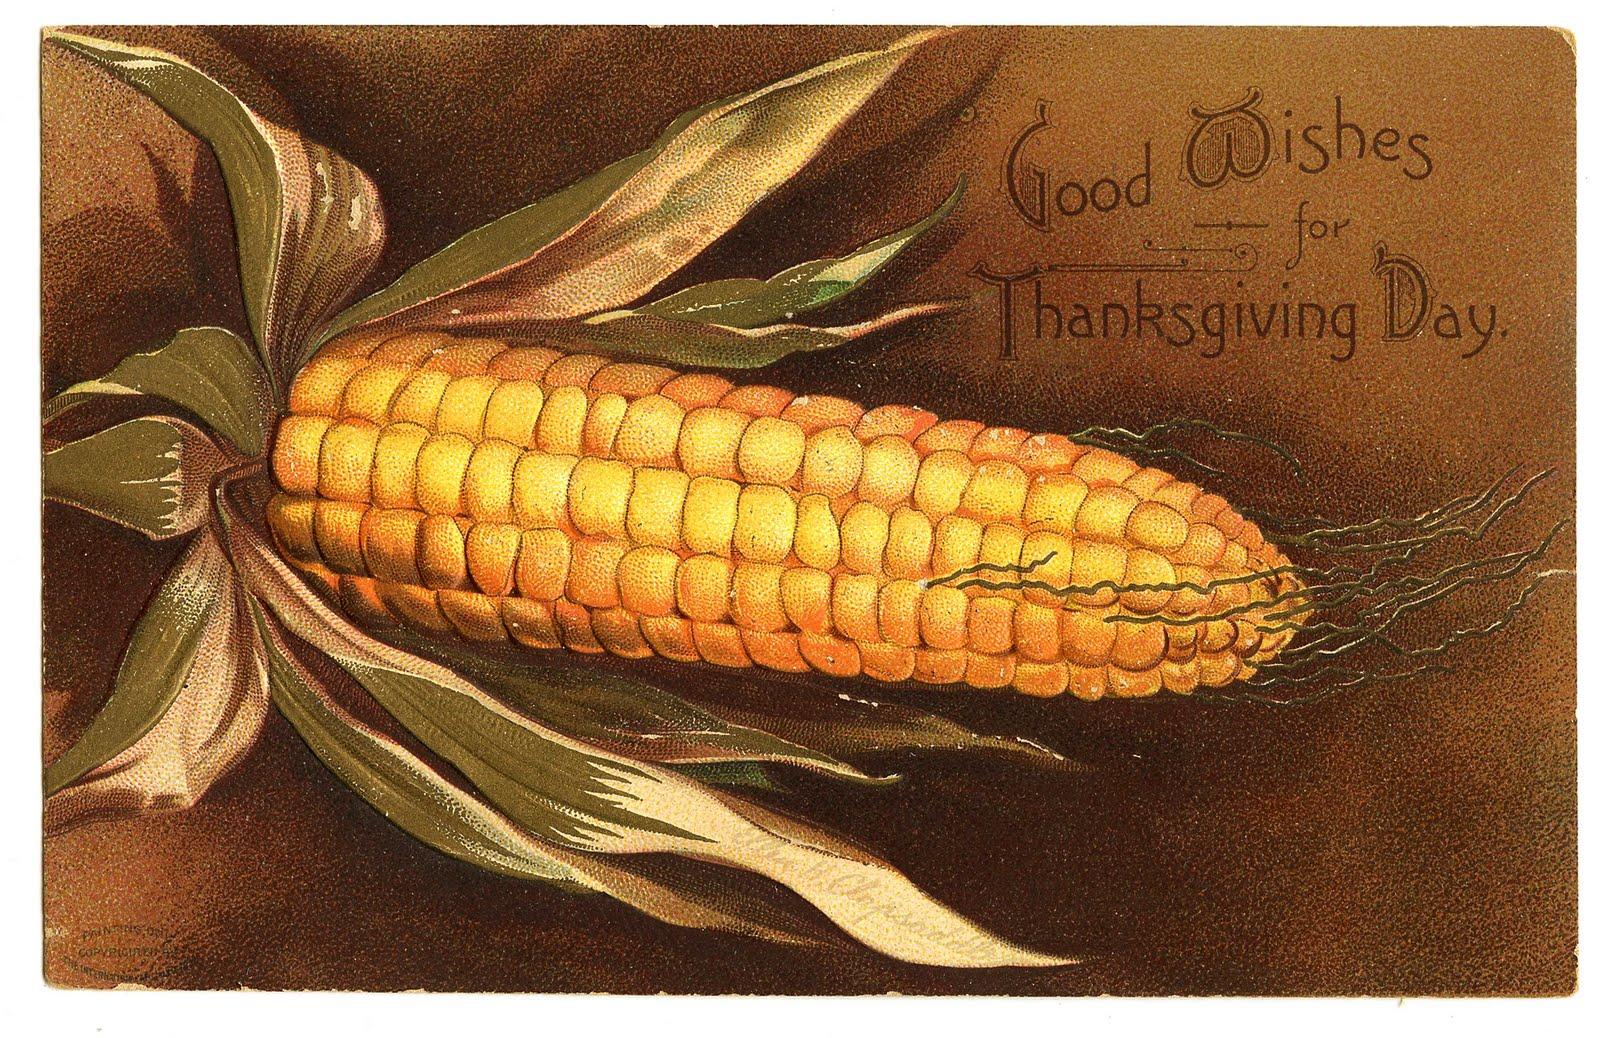 happy thanksgiving clip art, thanksgiving dinner clip art, thanksgiving clip art, borders thanksgiving food clip art, christian thanksgiving clip art